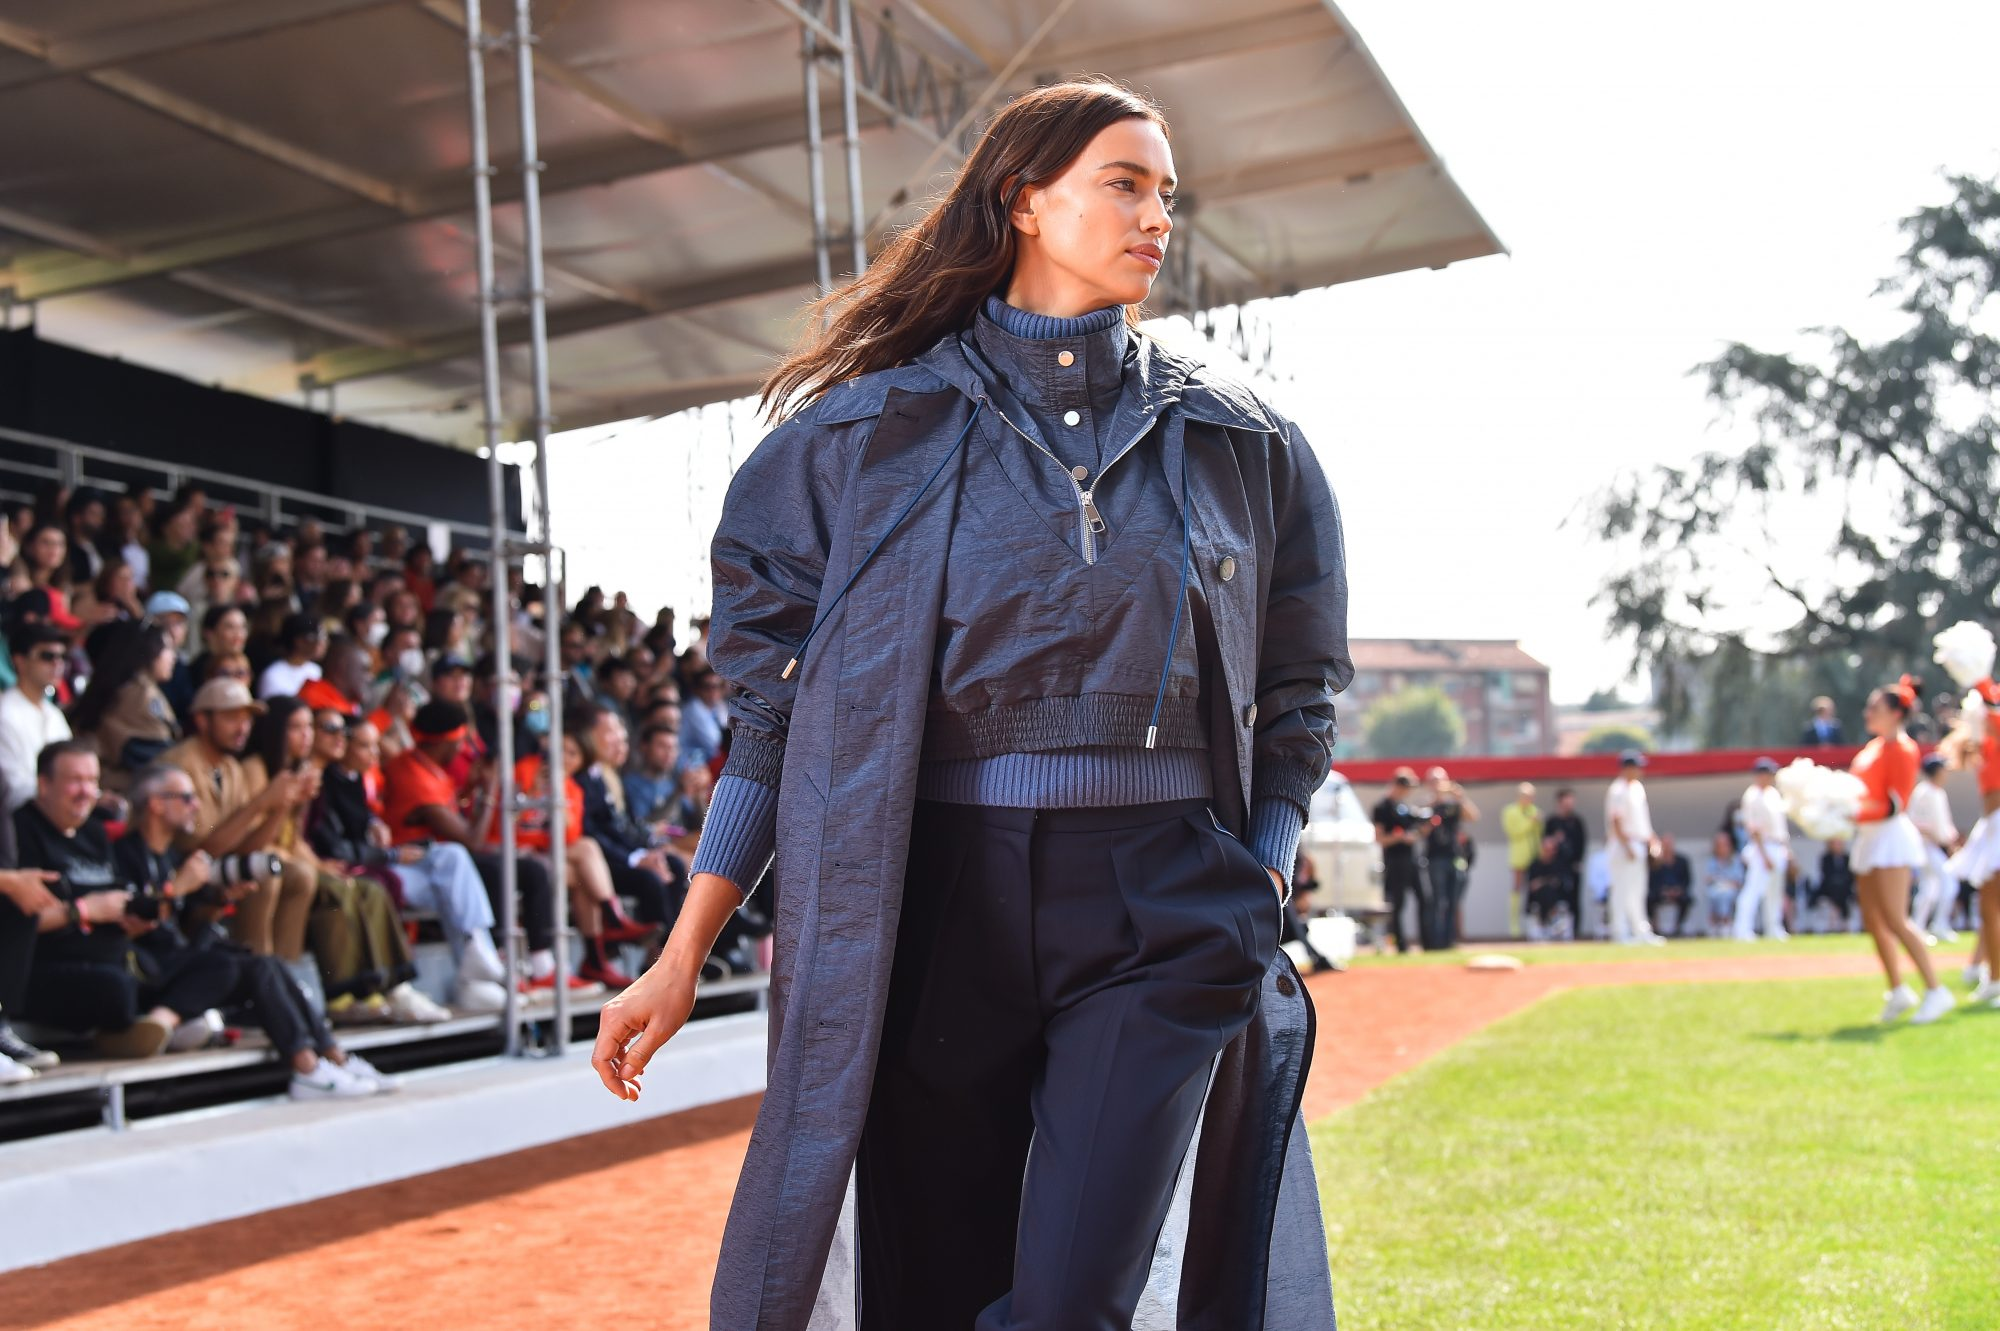 "Irina Shayk: Τα πανωφόρια της είναι το ένα καλύτερο από το άλλο Αντλούμε έμπνευση για ""shopping to the point"" αλλά και για υπέροχους συνδυασμούς για κάθε περίσταση από ένα από τα μεγαλύτερα street style αστέρια της παγκόσμιας βιομηχανίας, που πολλάκις μας έχουν ενθουσιάσει με το στυλ της."